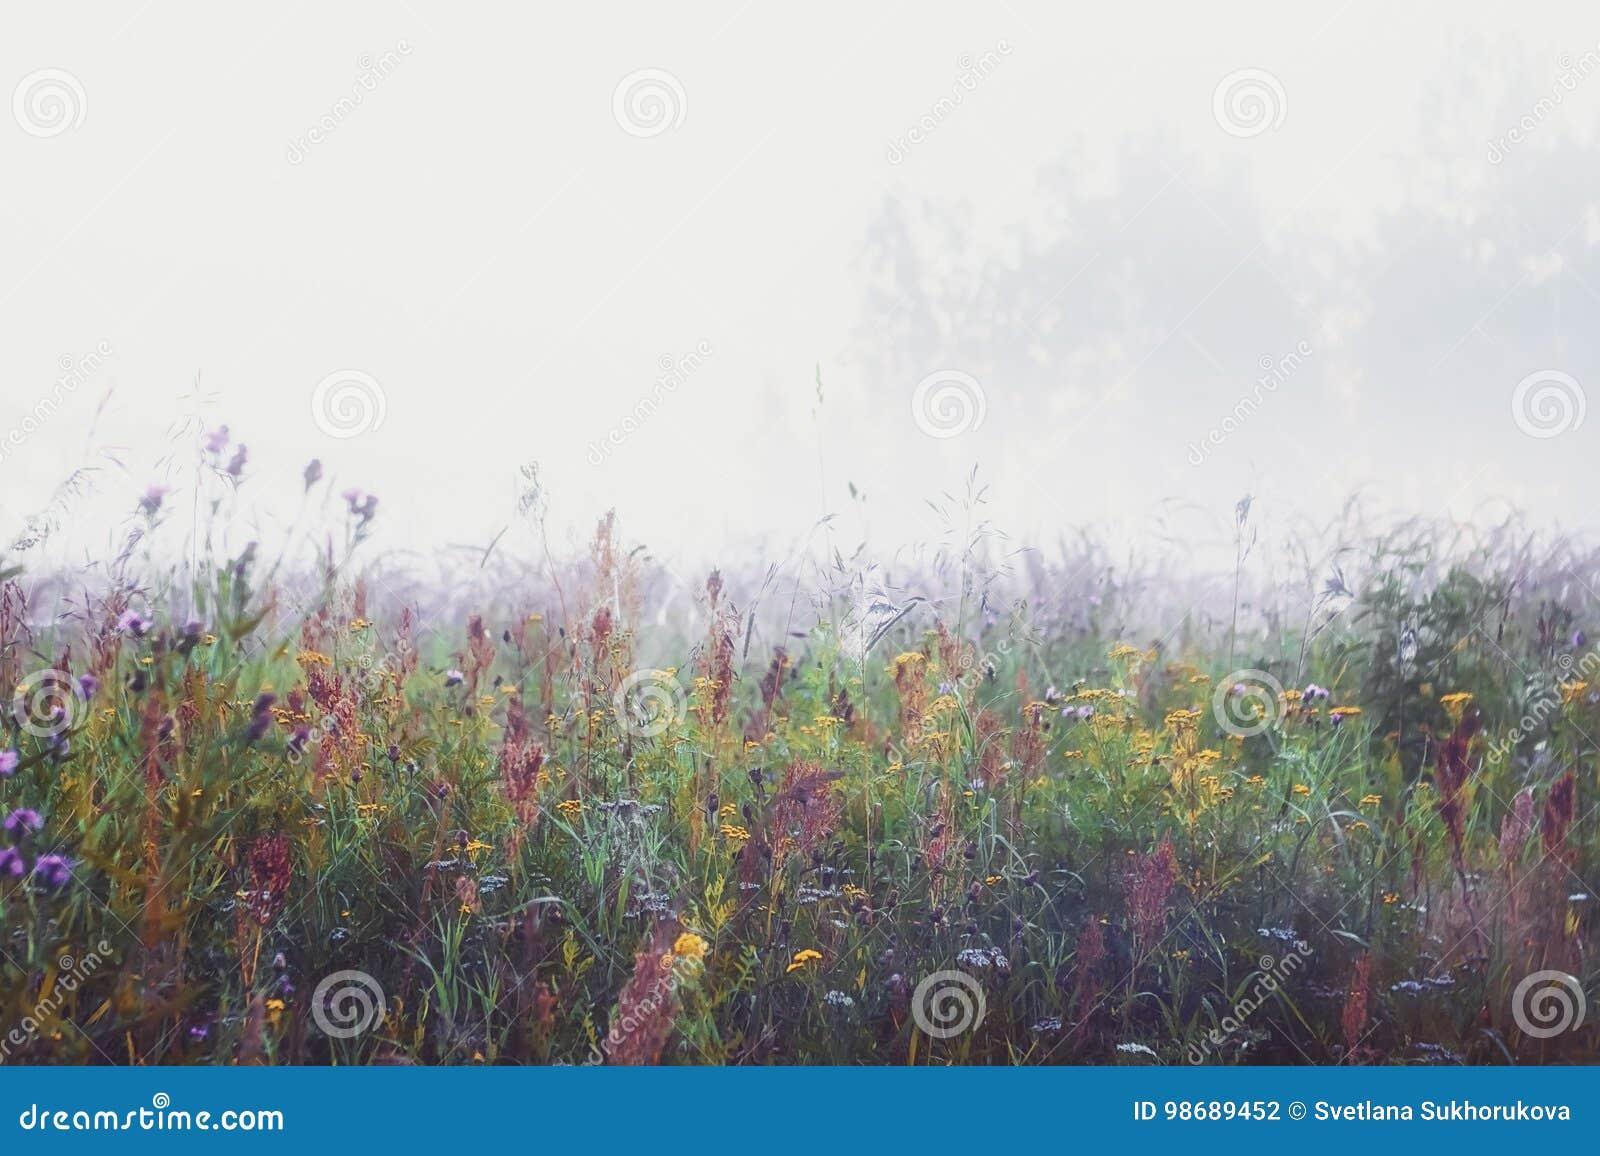 Misty Morning In The Meadow